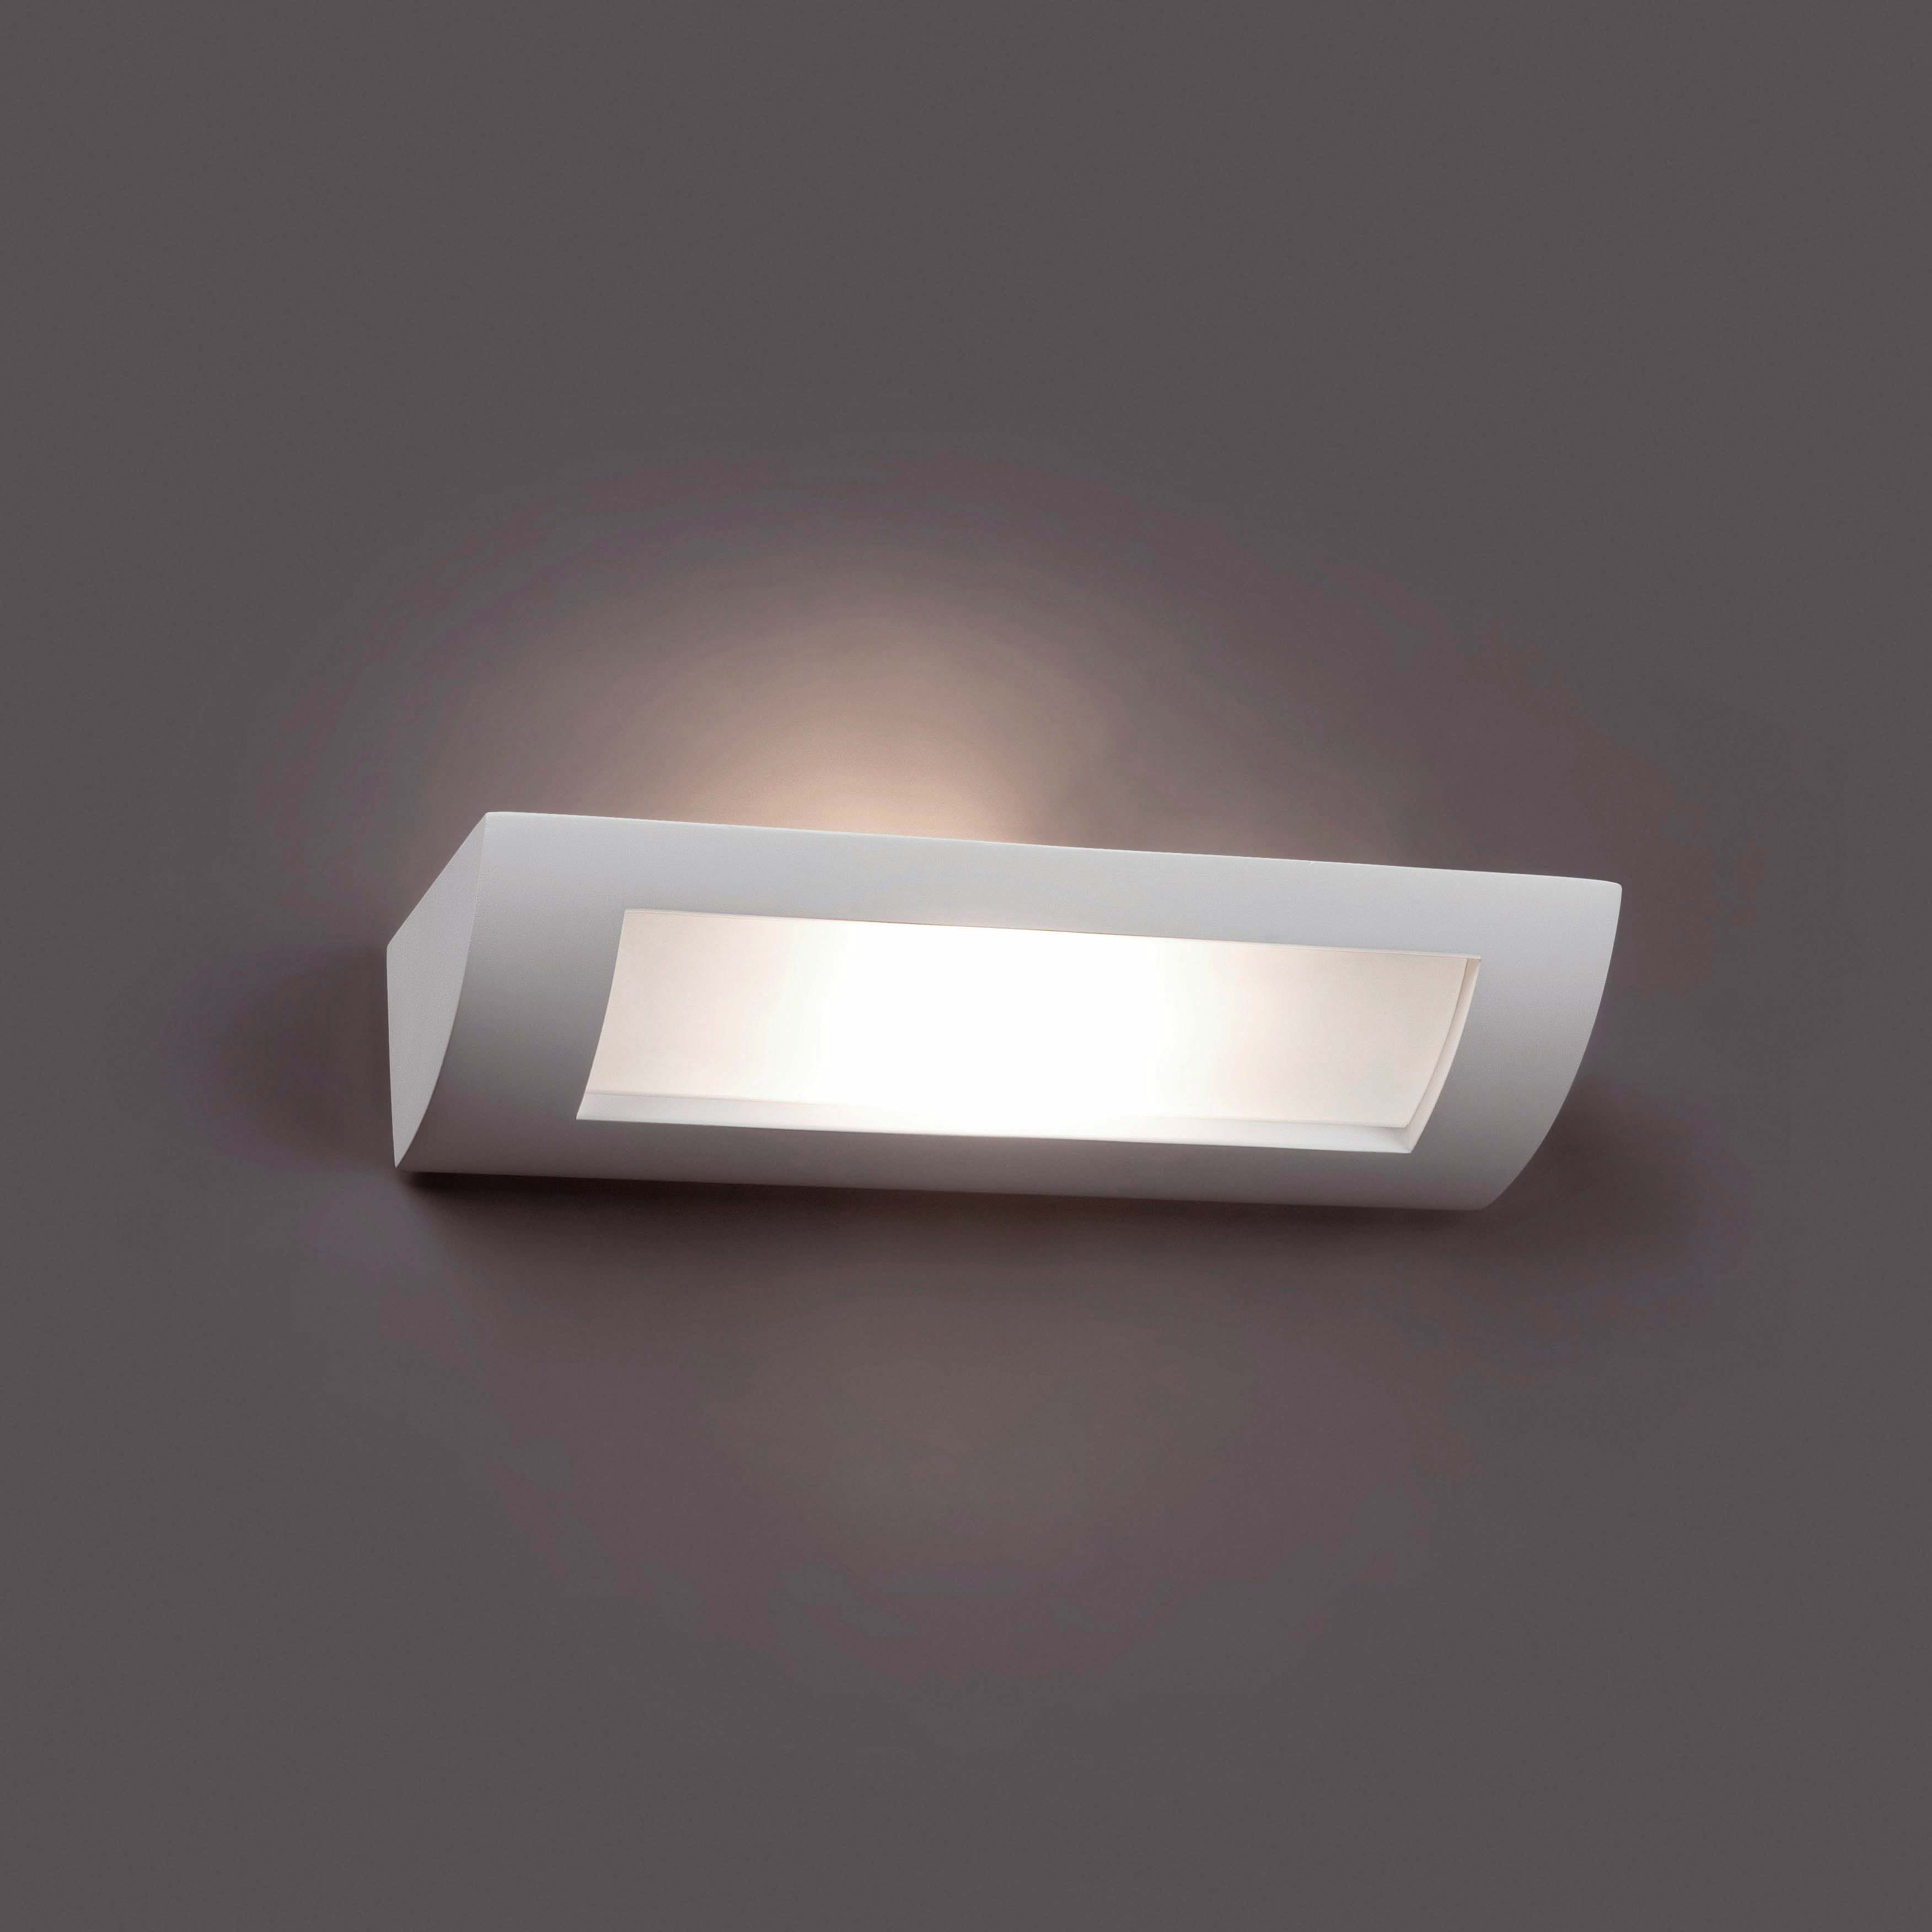 Cheras 4 Wall Lamp R7s JP78 100W White